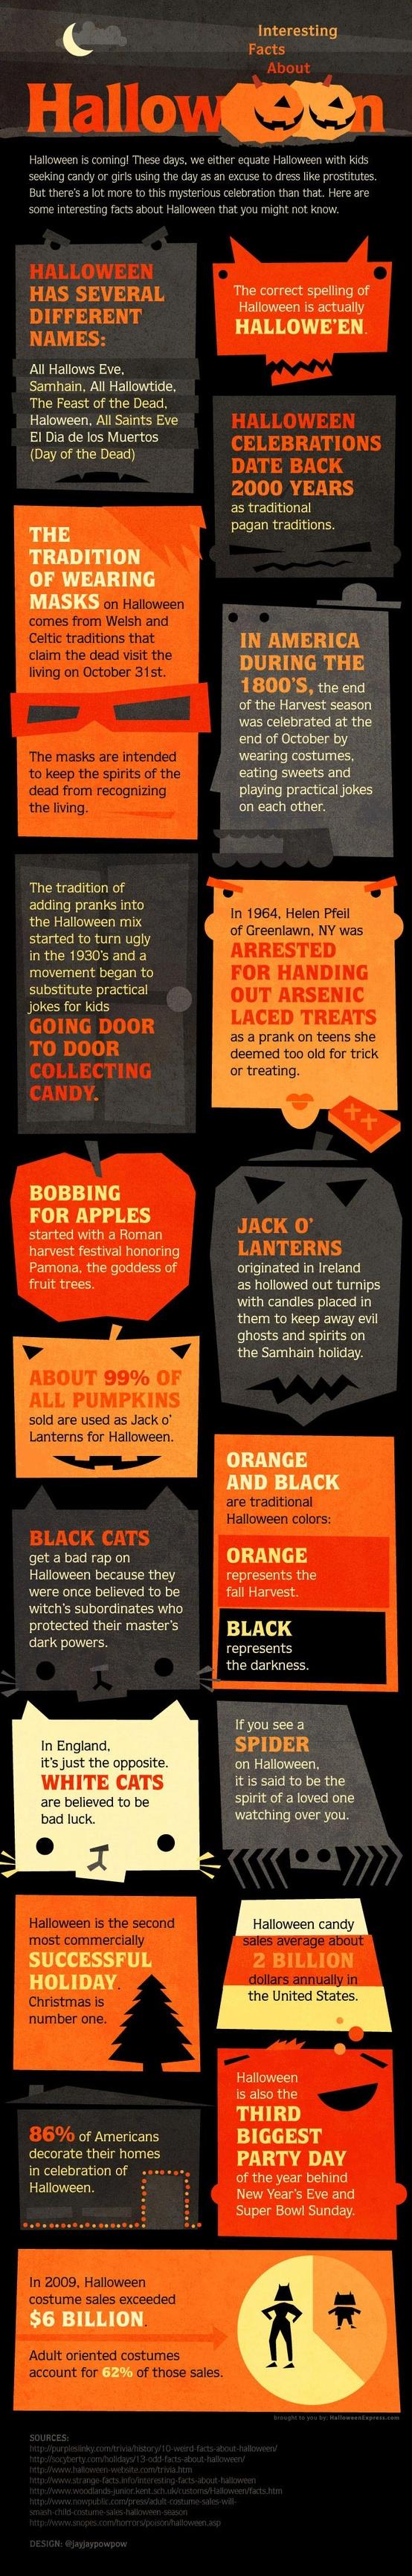 Infographic by HalloweenExpress.com